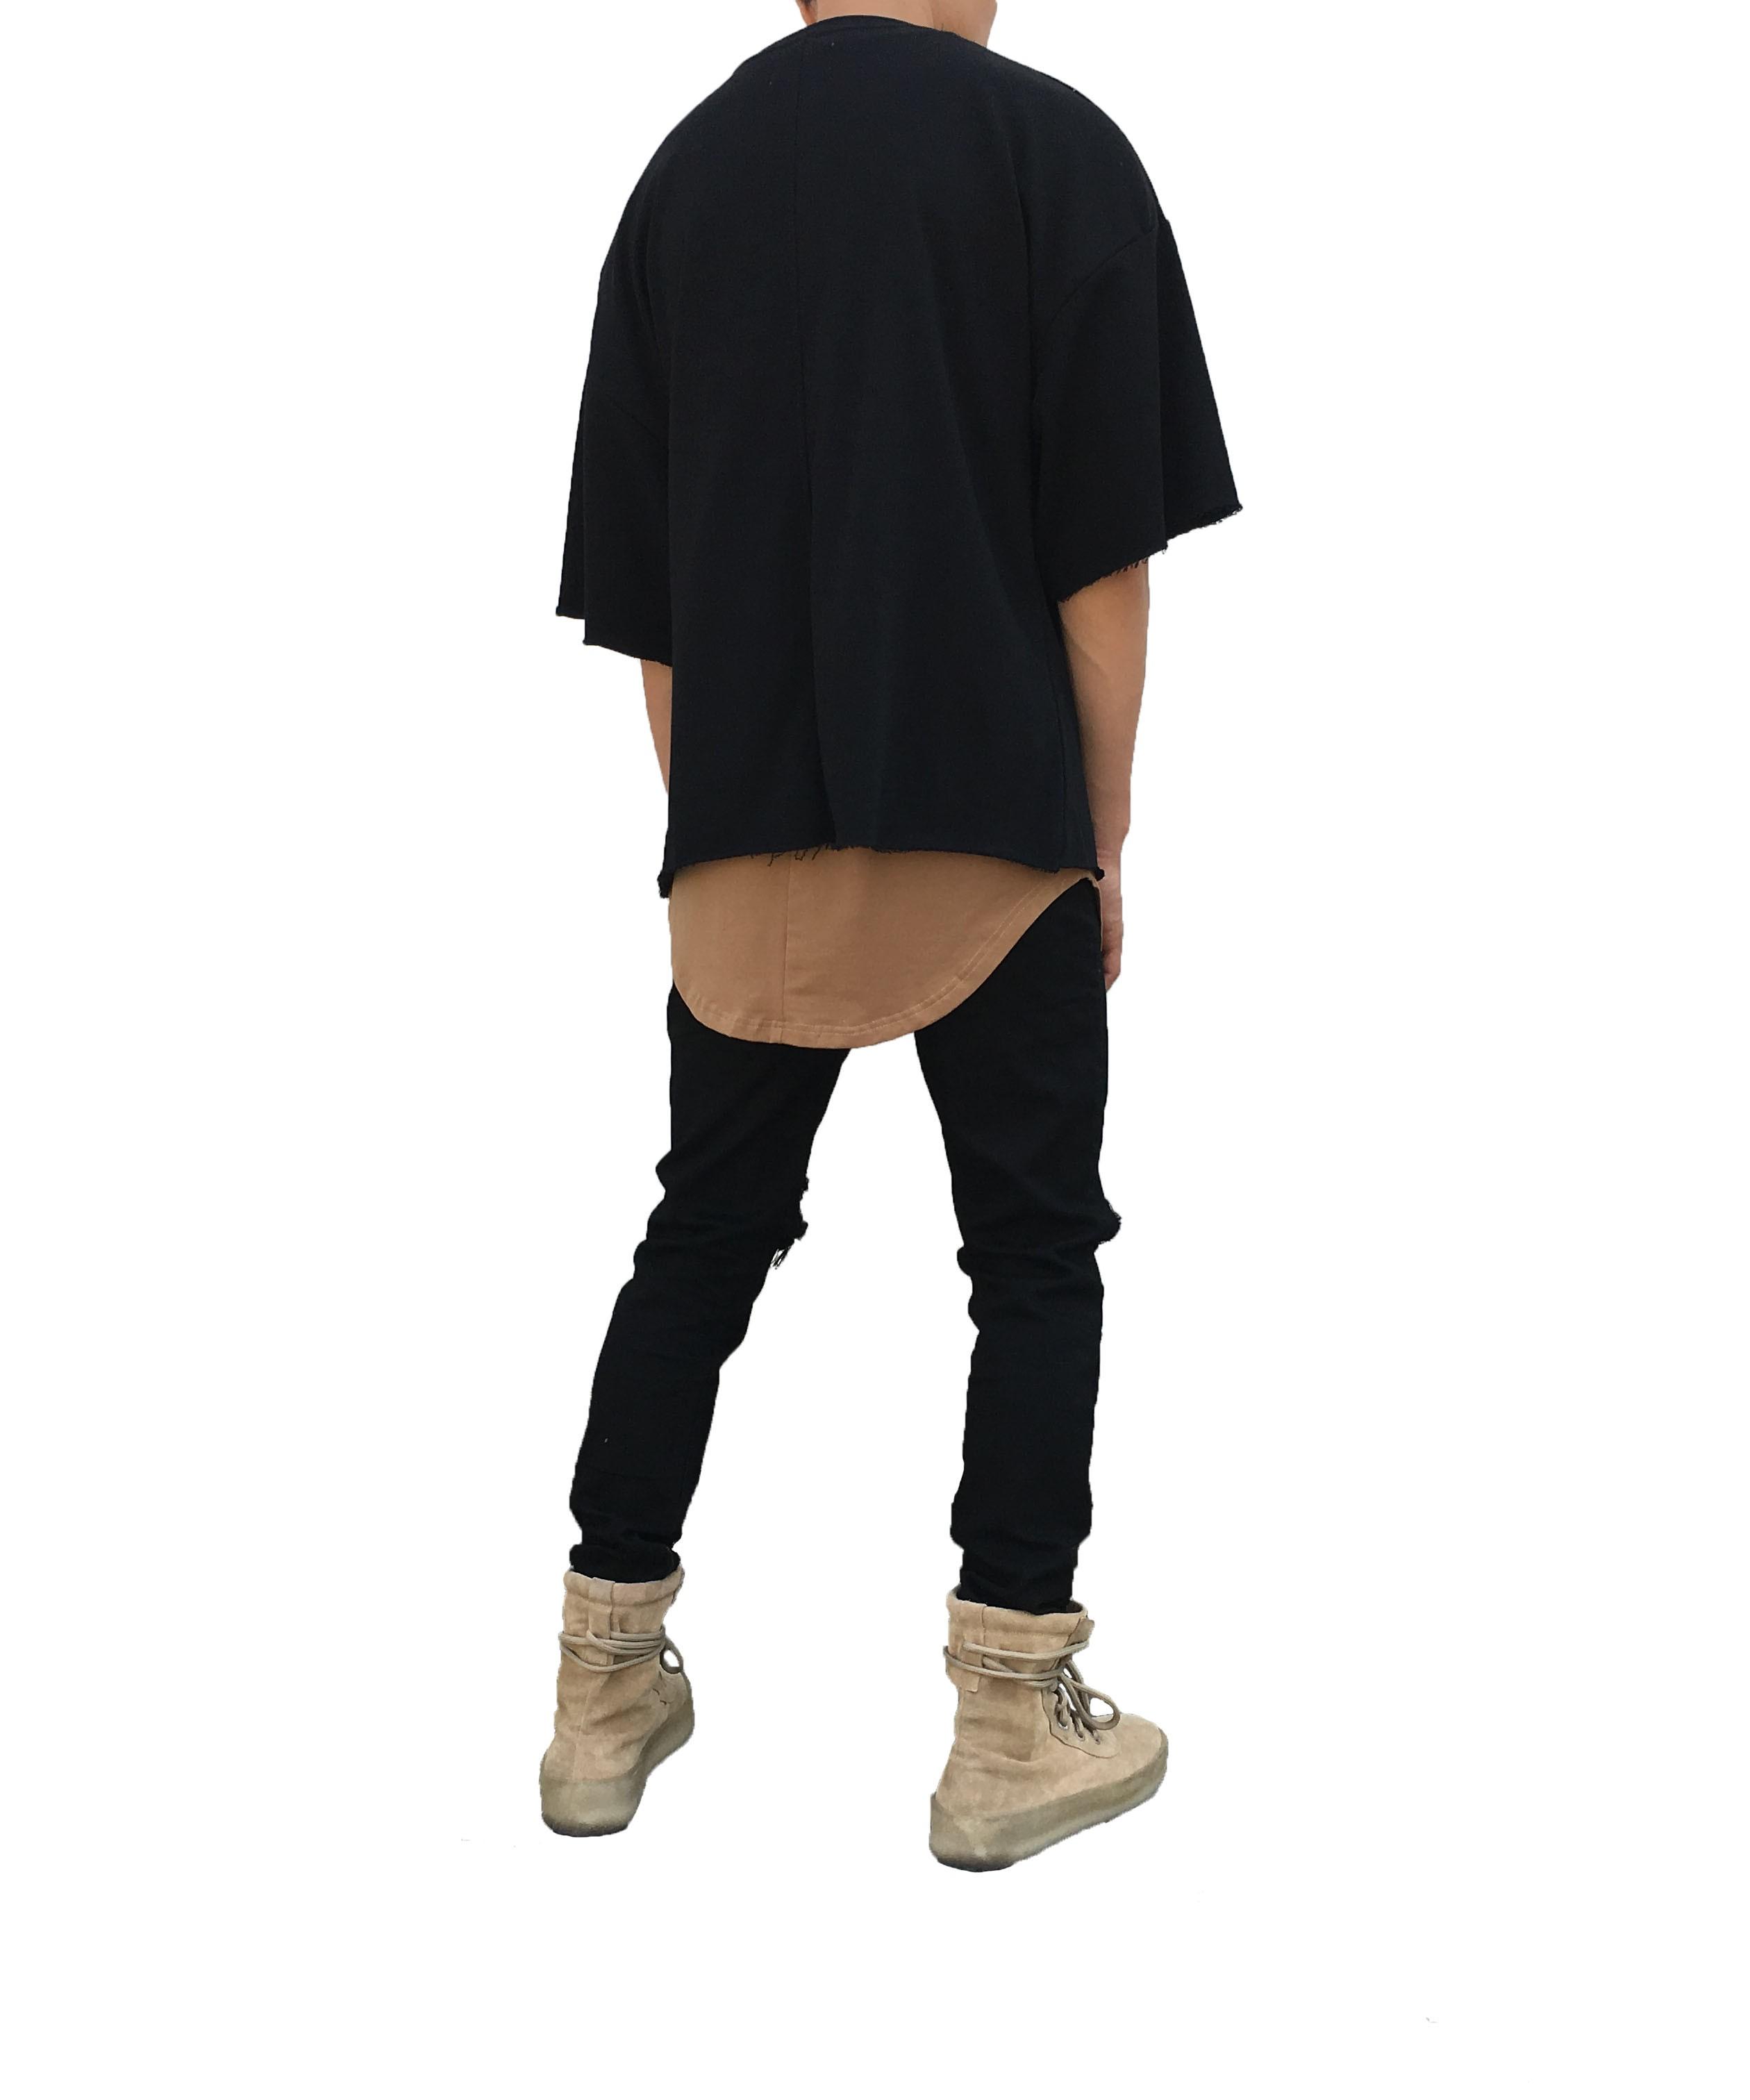 RAW SHORT SLEEVE SWEATER YELLOW   T Shirts   Ontario, Canada